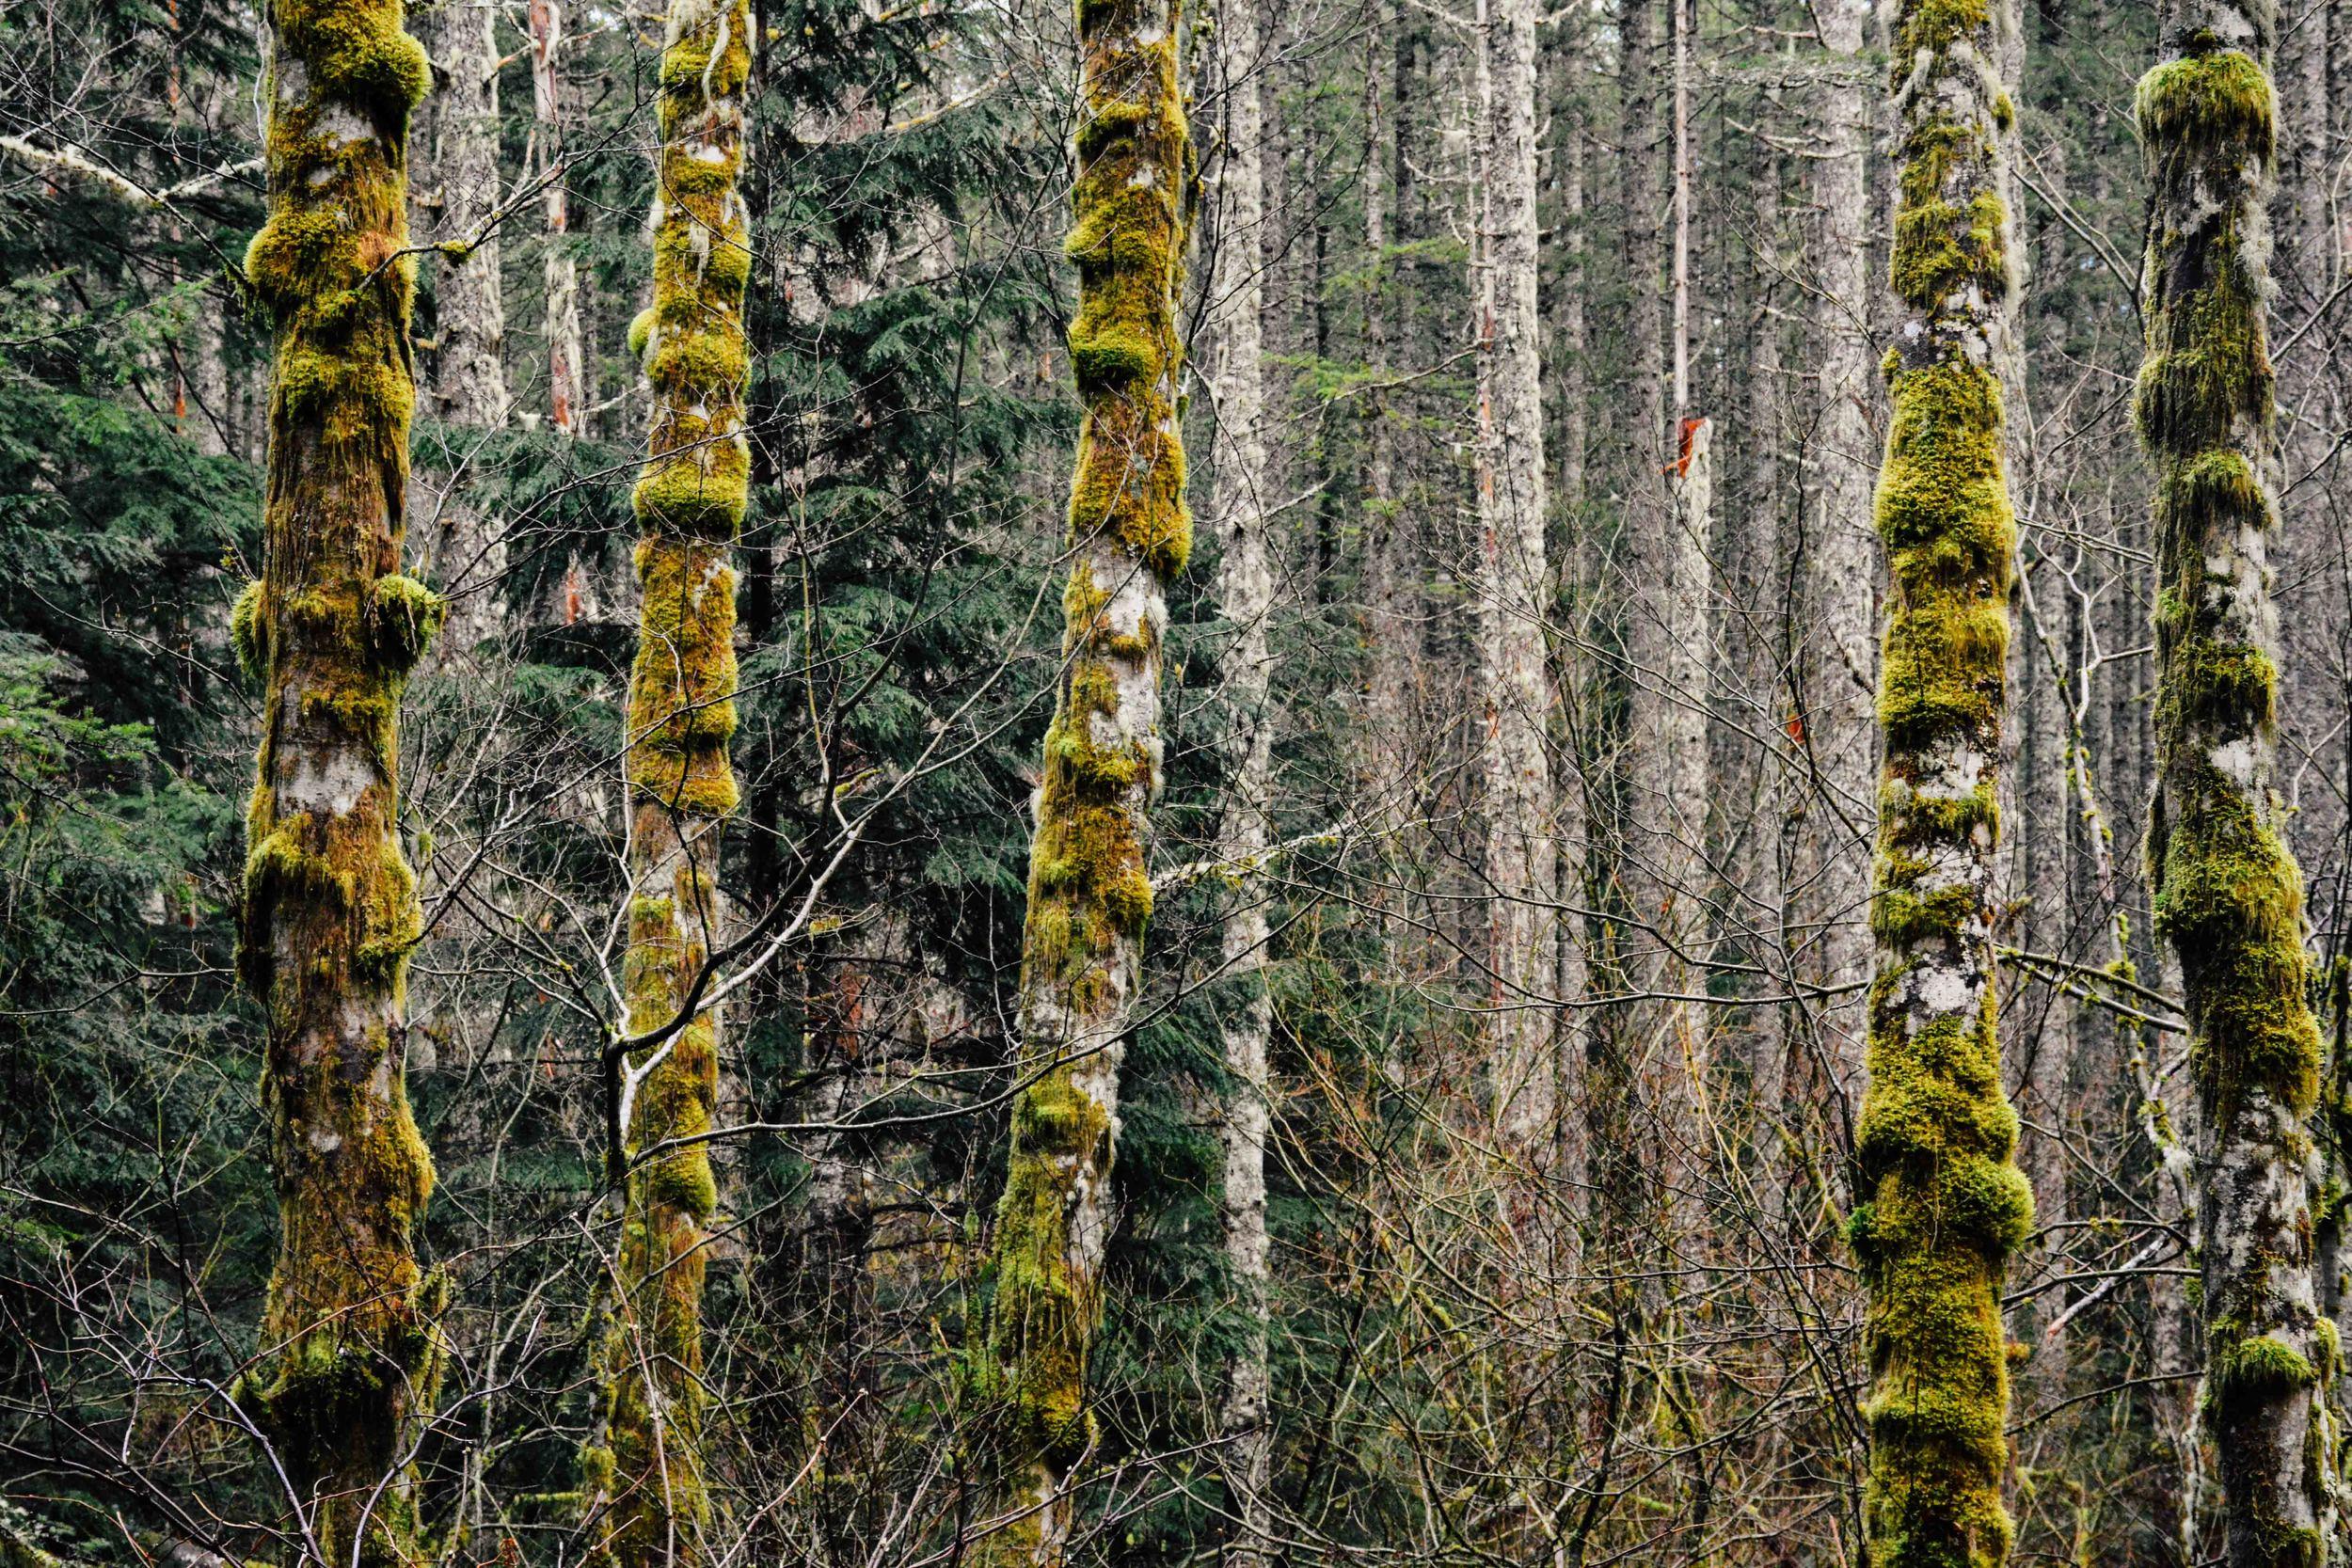 Mossy Trees 2